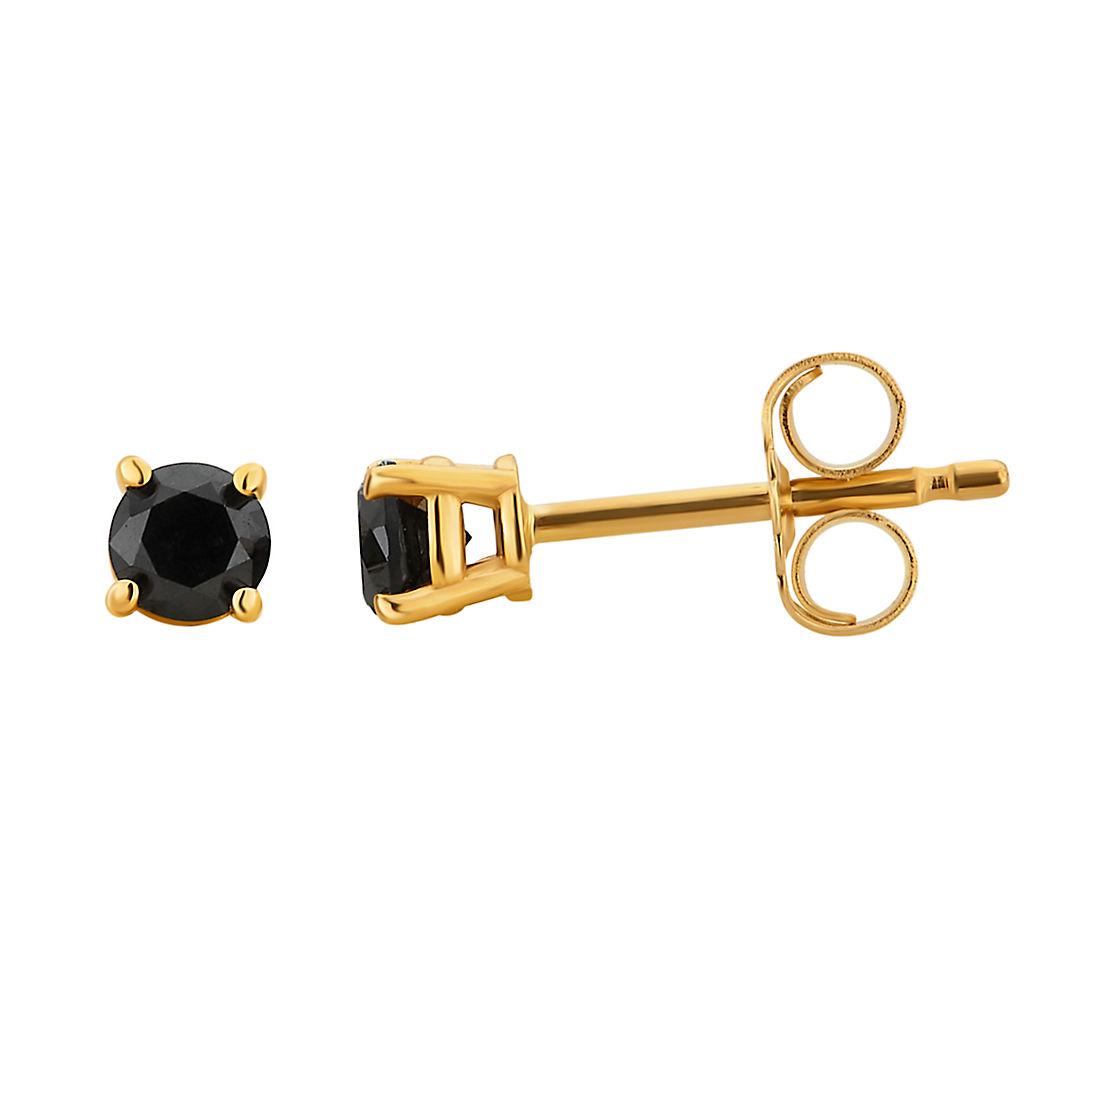 50 Ct T W Black Diamond Studs In 14k Yellow Gold